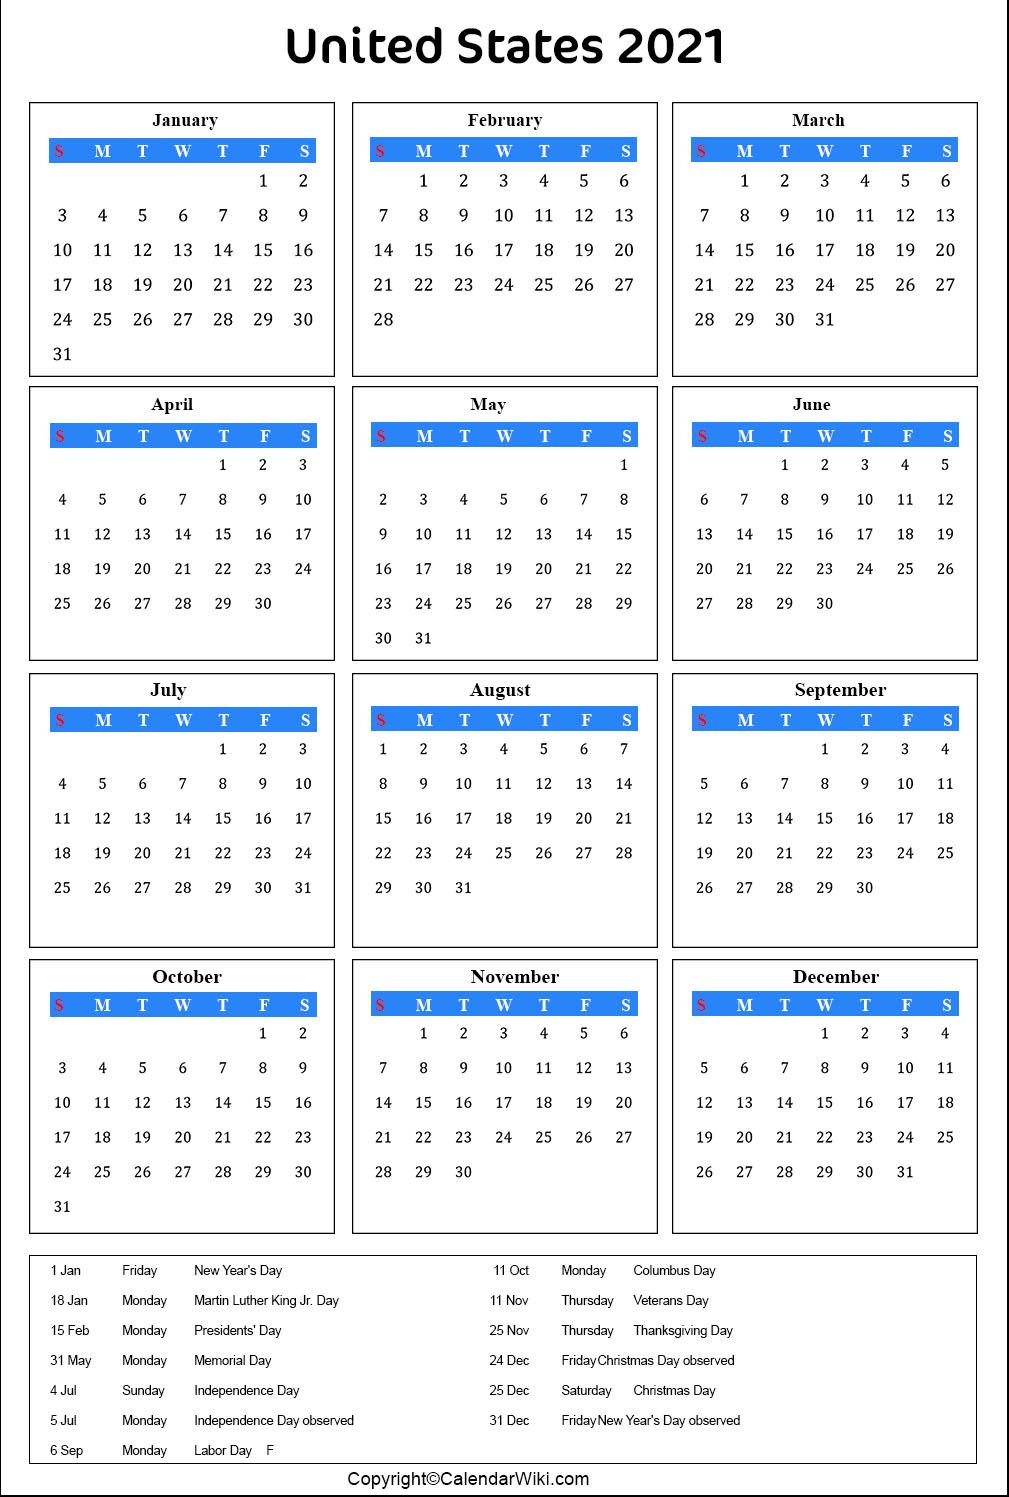 Google calendar doesn't show any holidays by default. Printable Us Calendar 2021 with Holidays Public Holidays